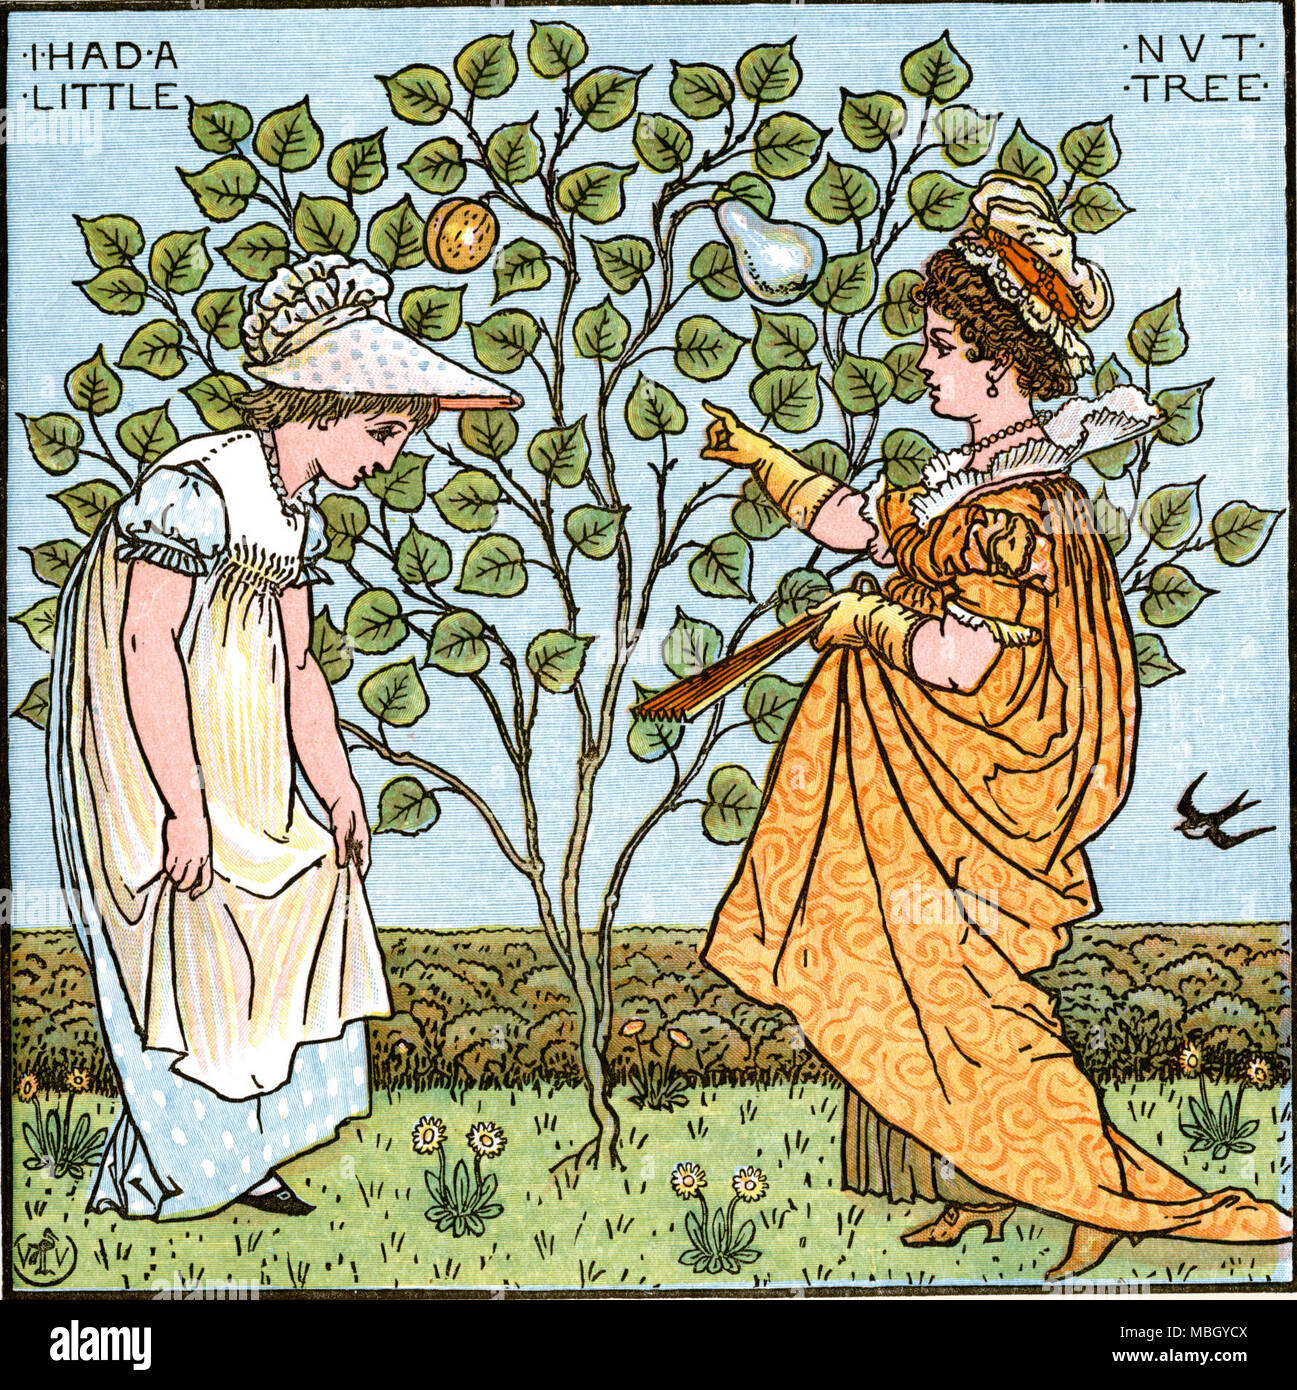 I Had a Little Nut Tree - Stock Image